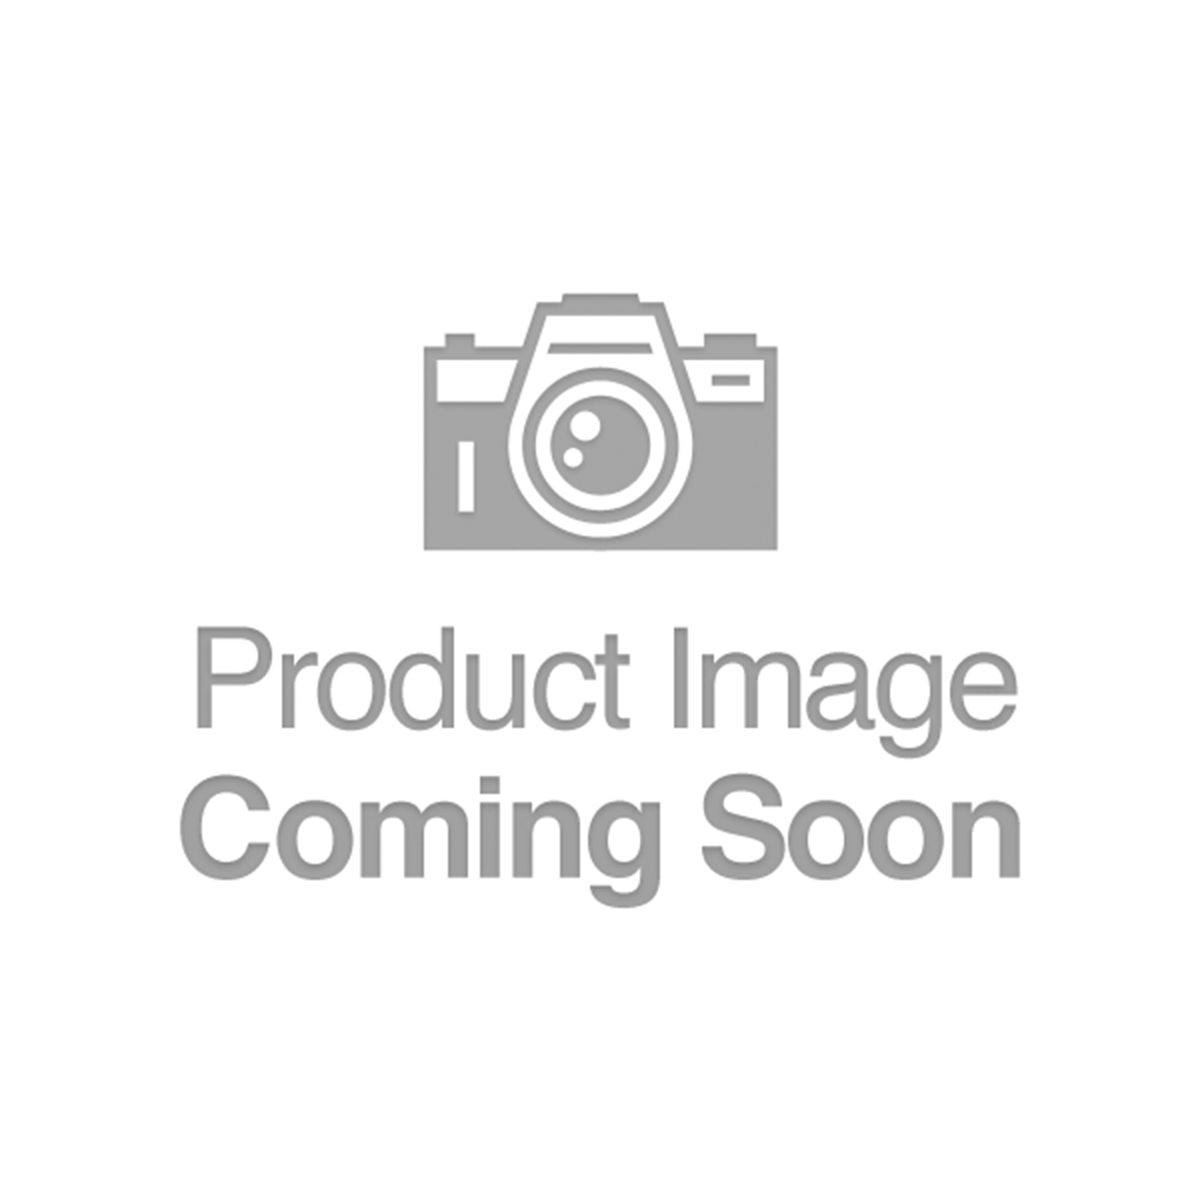 Princeton - New Jersey - CH 4872 - FR 1802-1 - PMG 67 EPQ